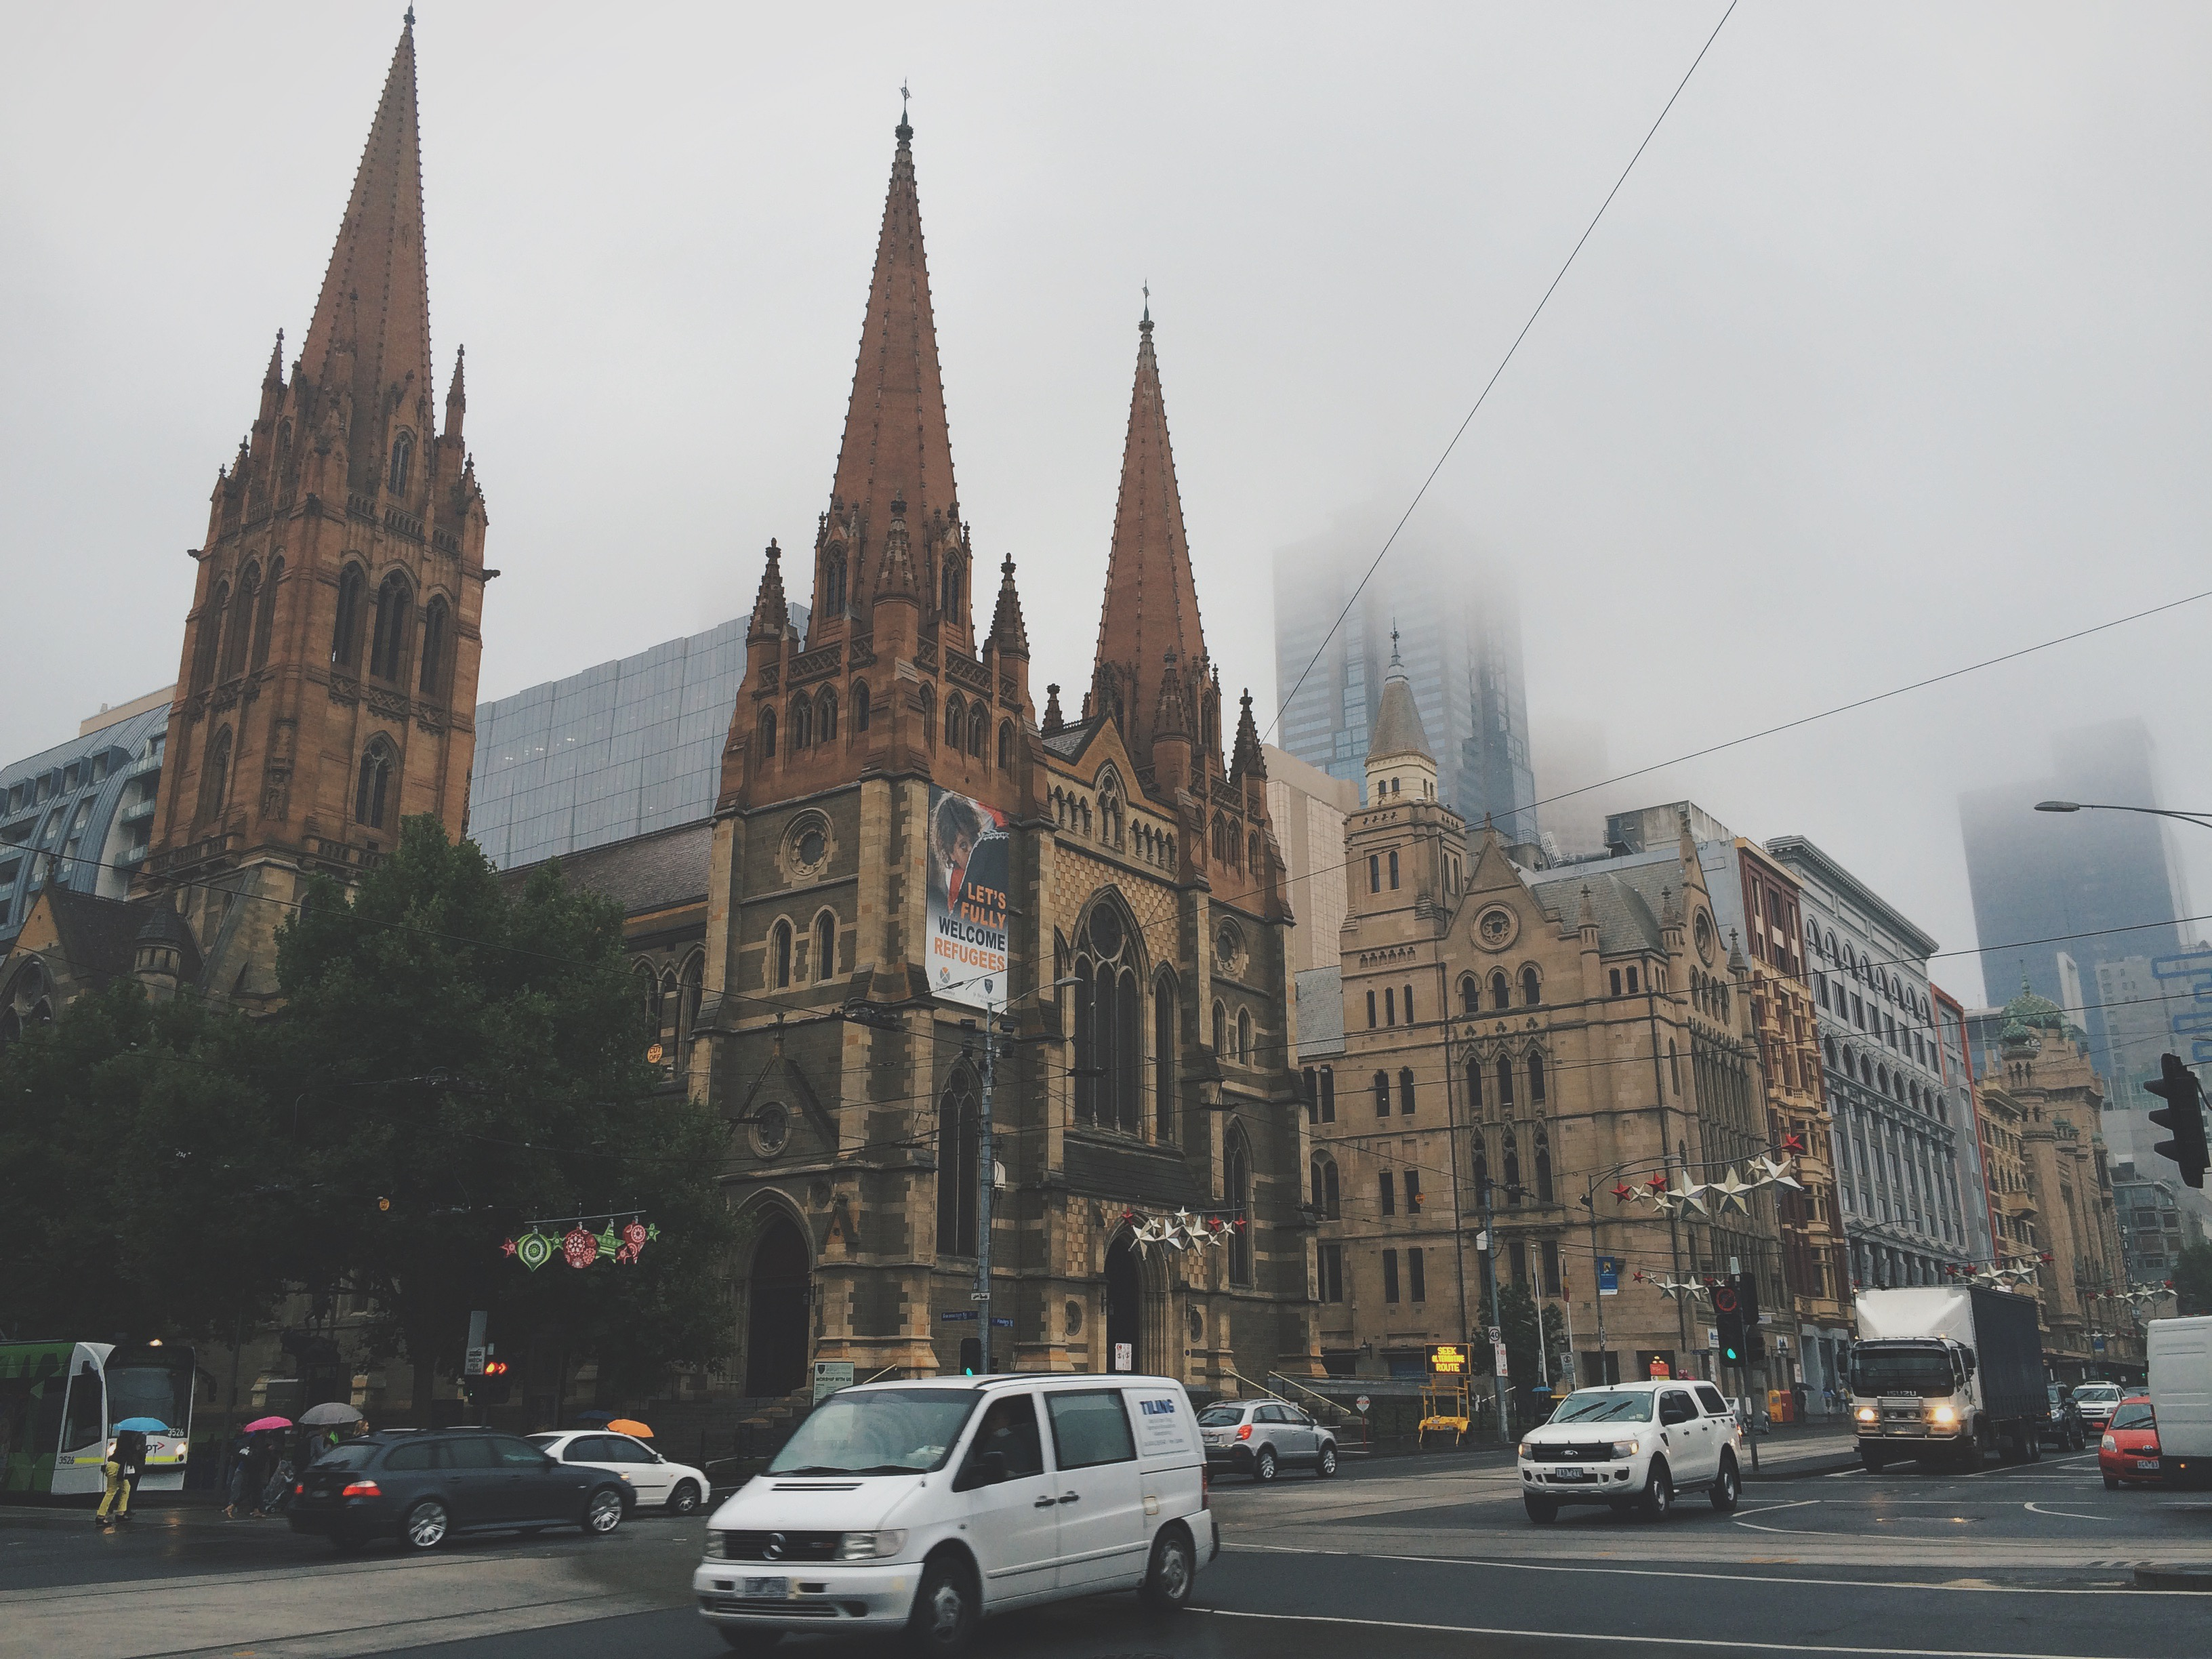 Bramble and Thorn, 7 Things, Melbourne, Flinders Street, Storm, Rain, Summer